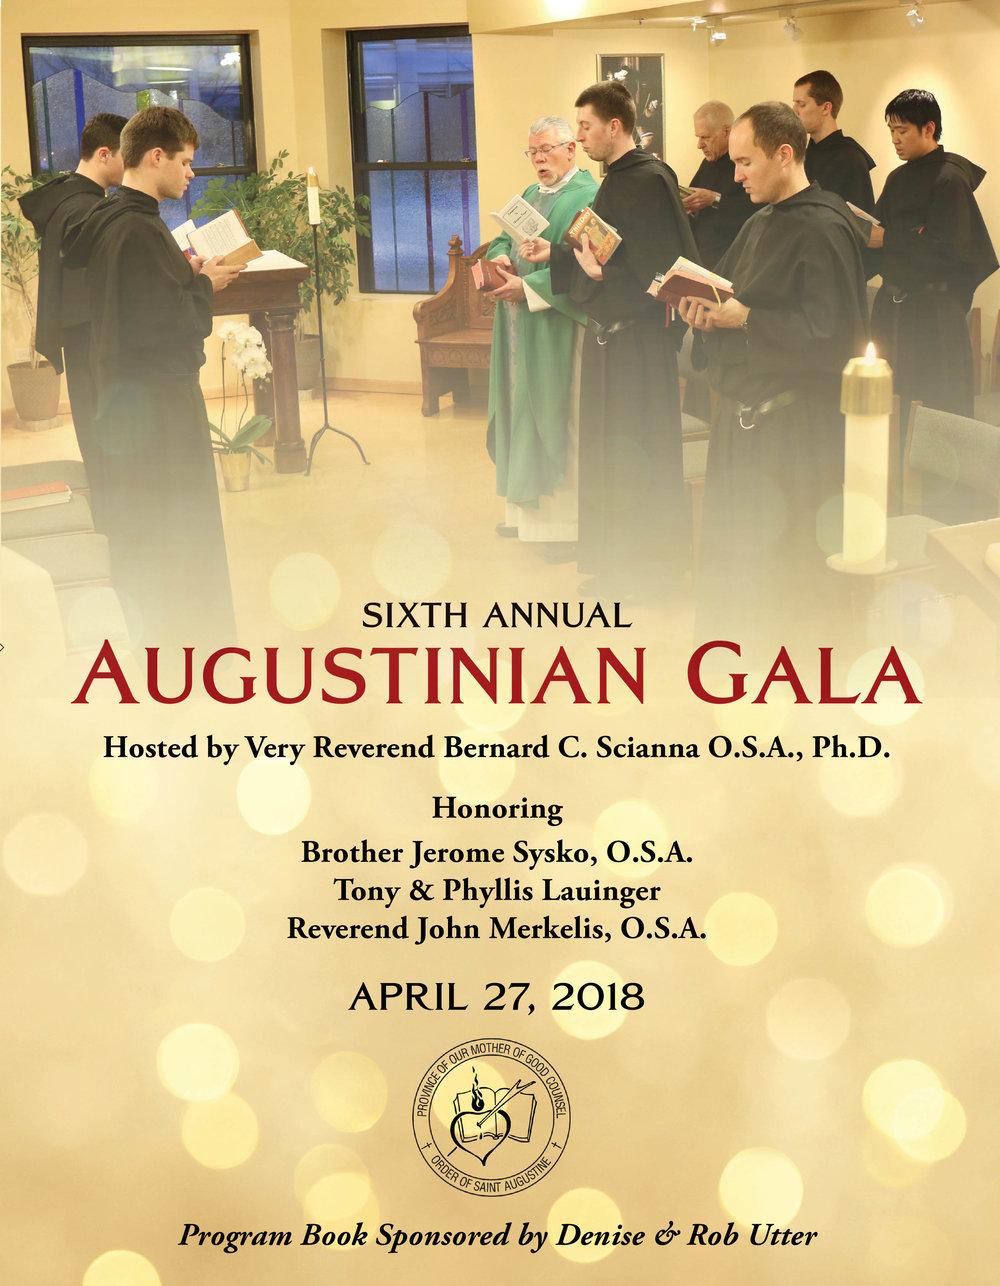 2018 Gala Program Book